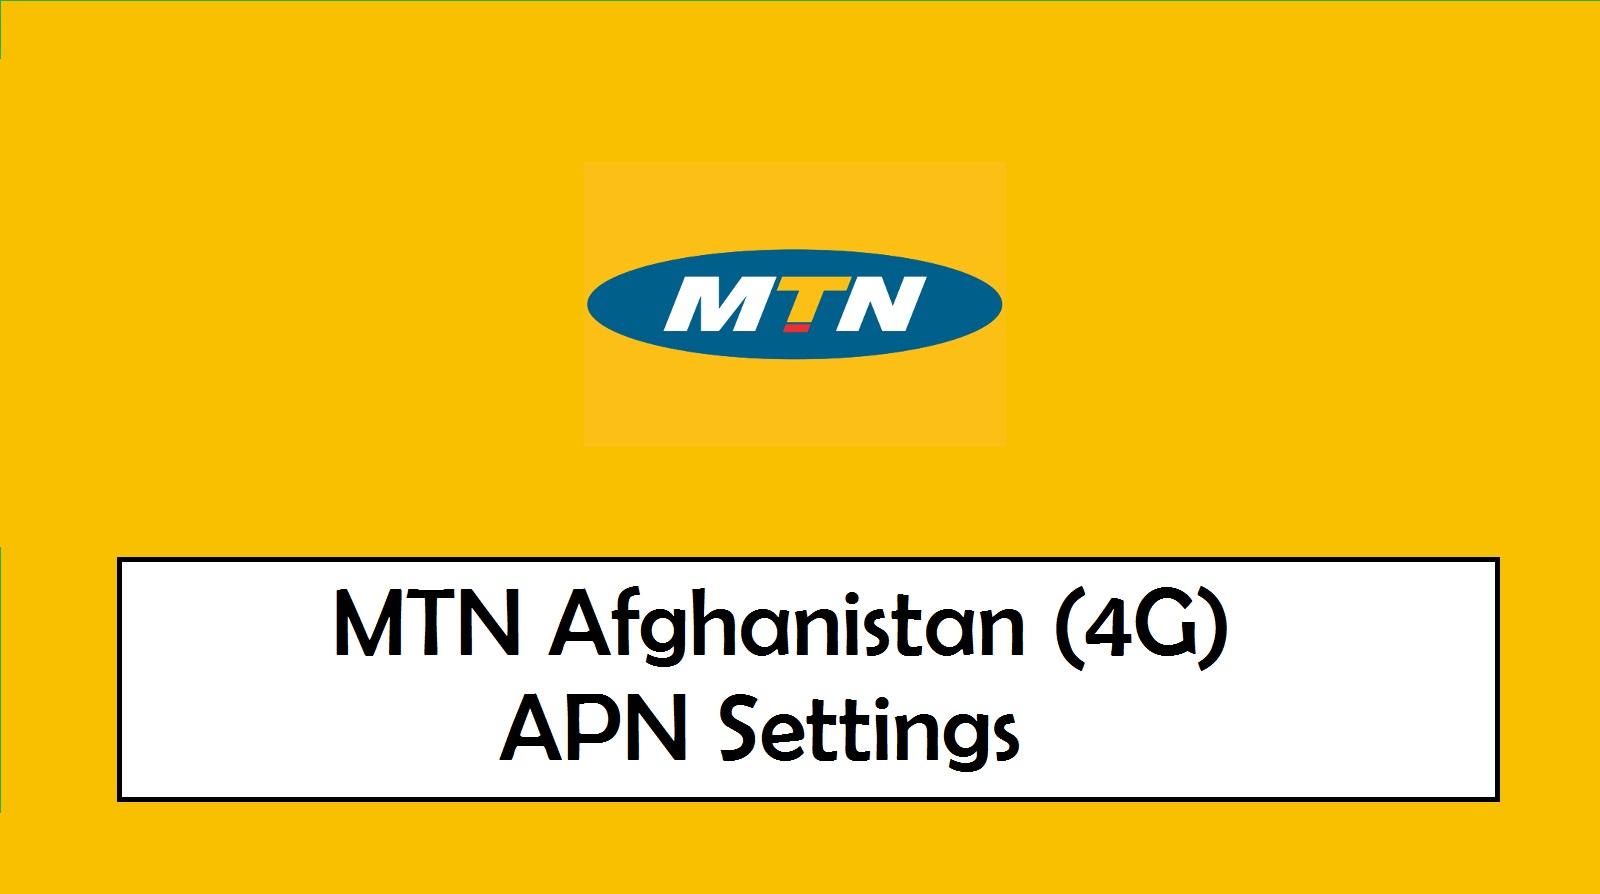 MTN Afghanistan APN Settings